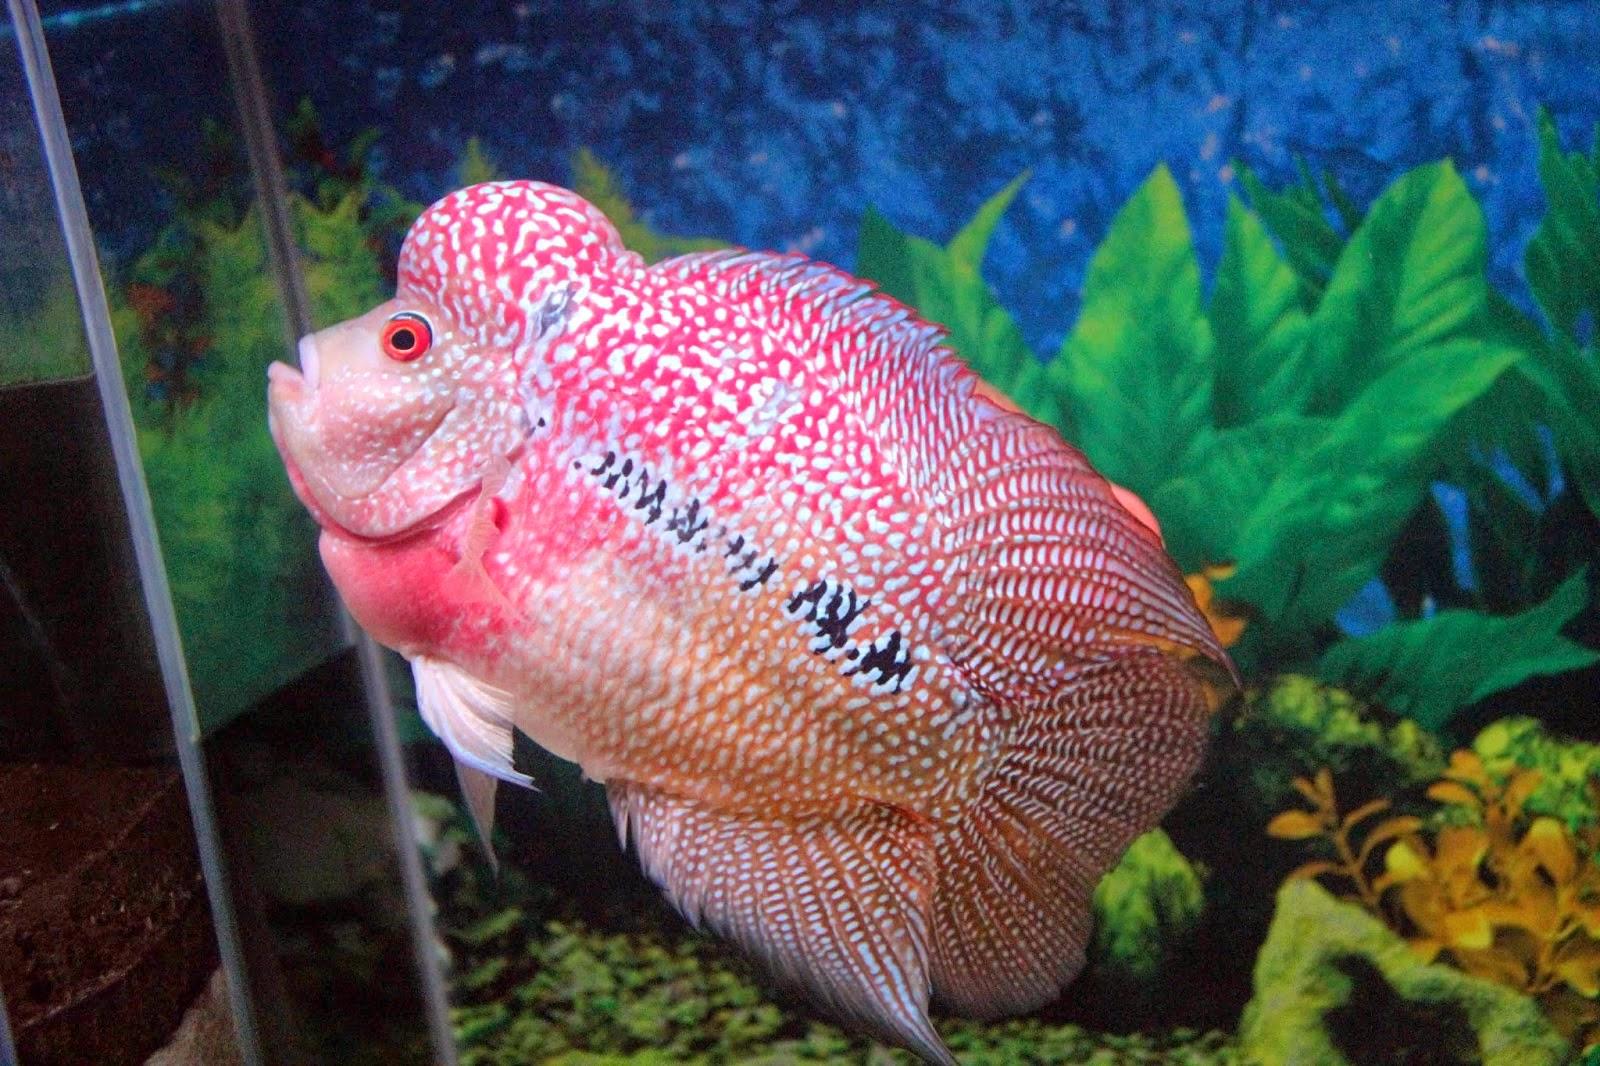 5 Ikan Hias Cantik Yang Cocok Untuk Mengisi Akuarium Istana Ikan Hias